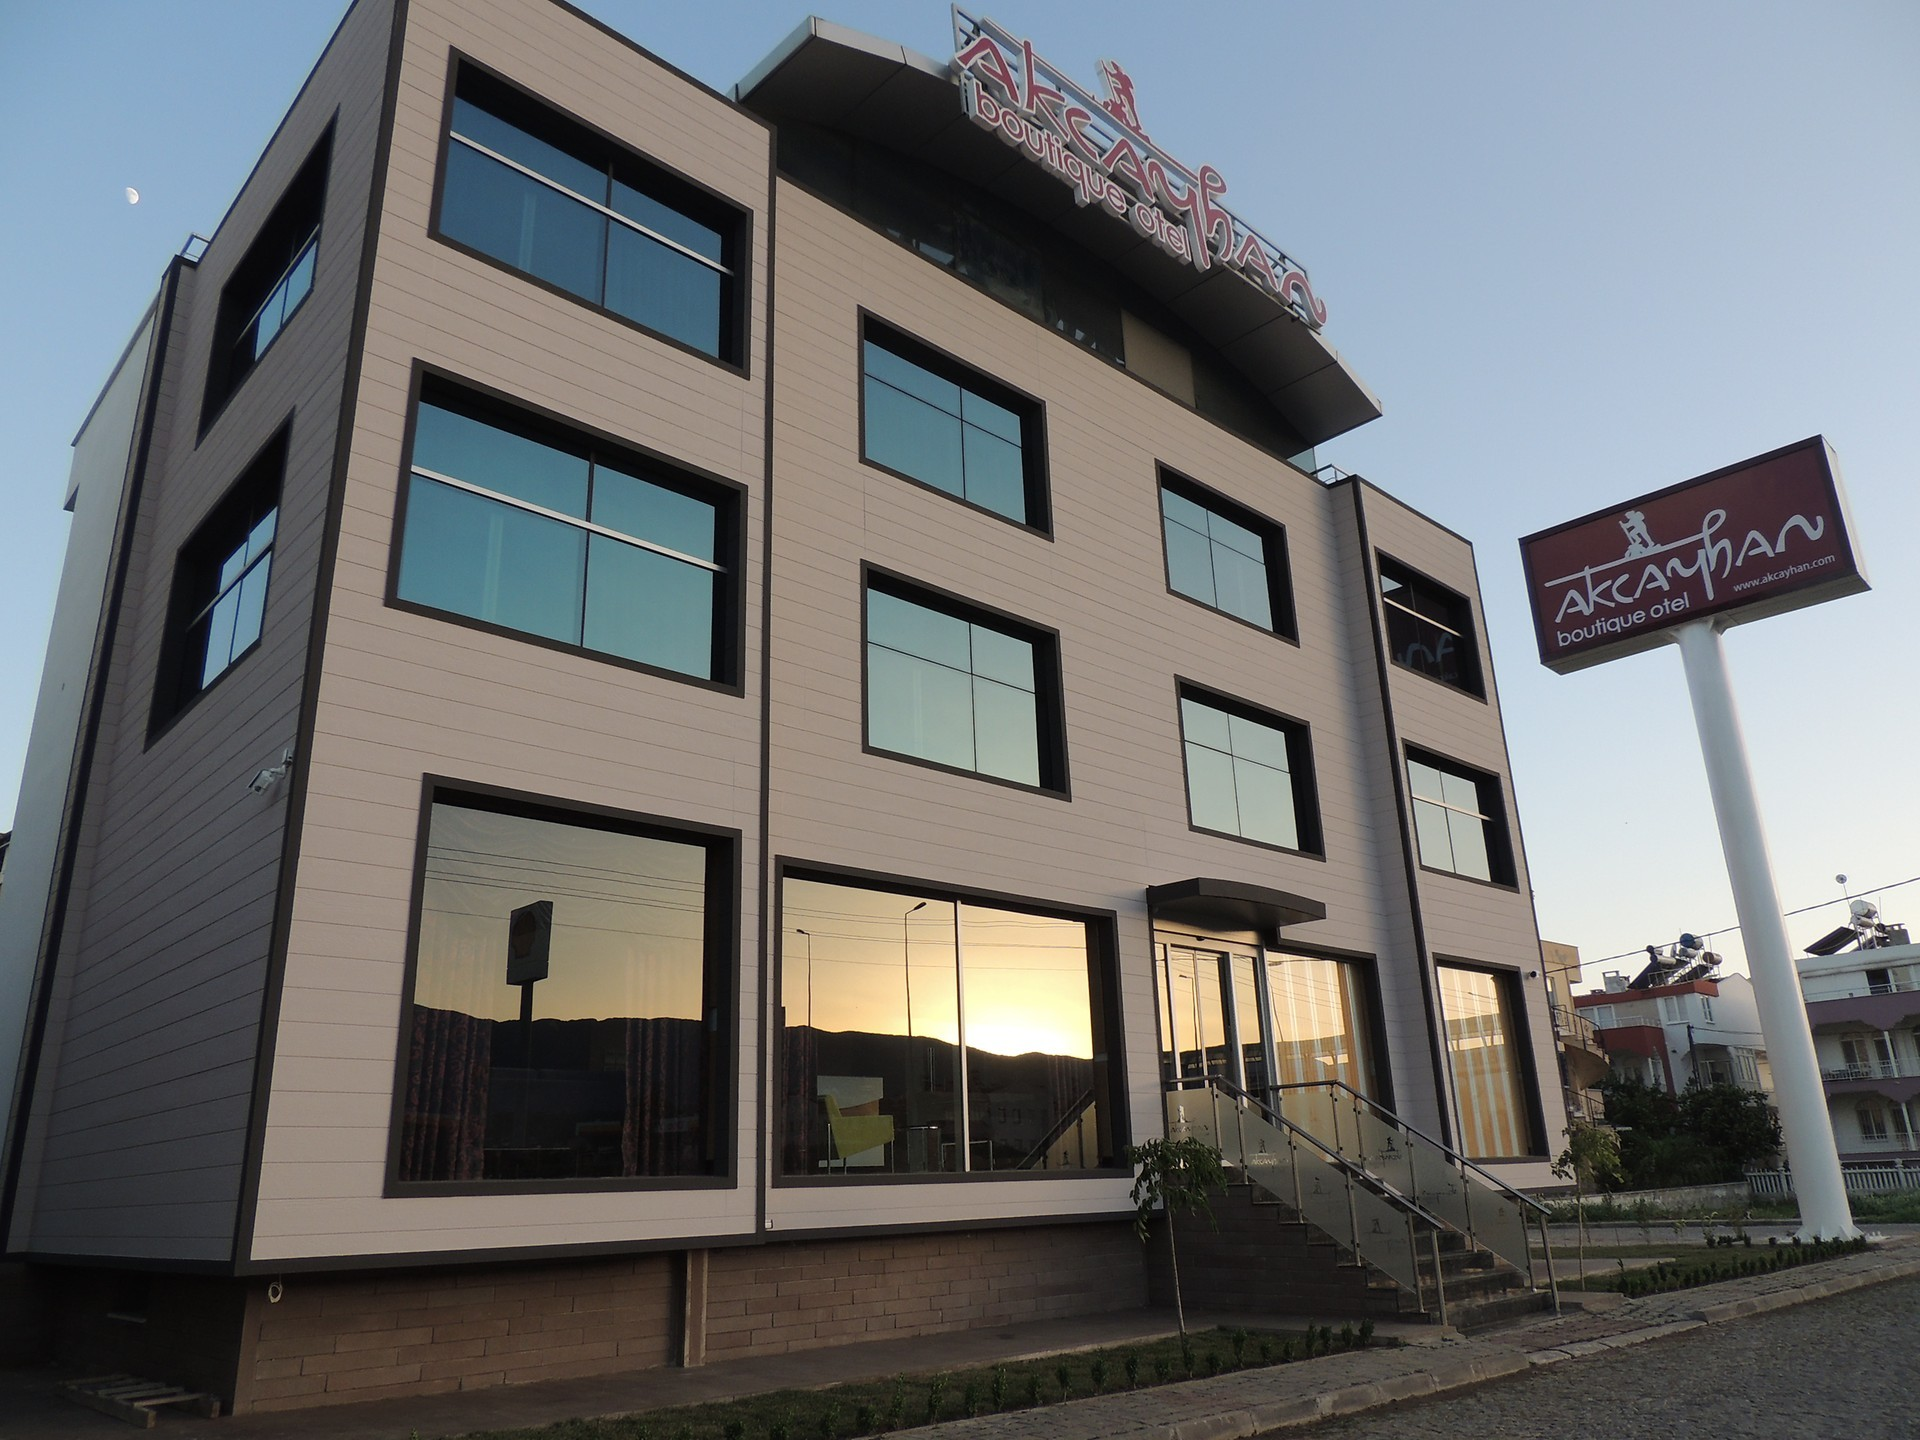 Akçayhan Boutique Hotel